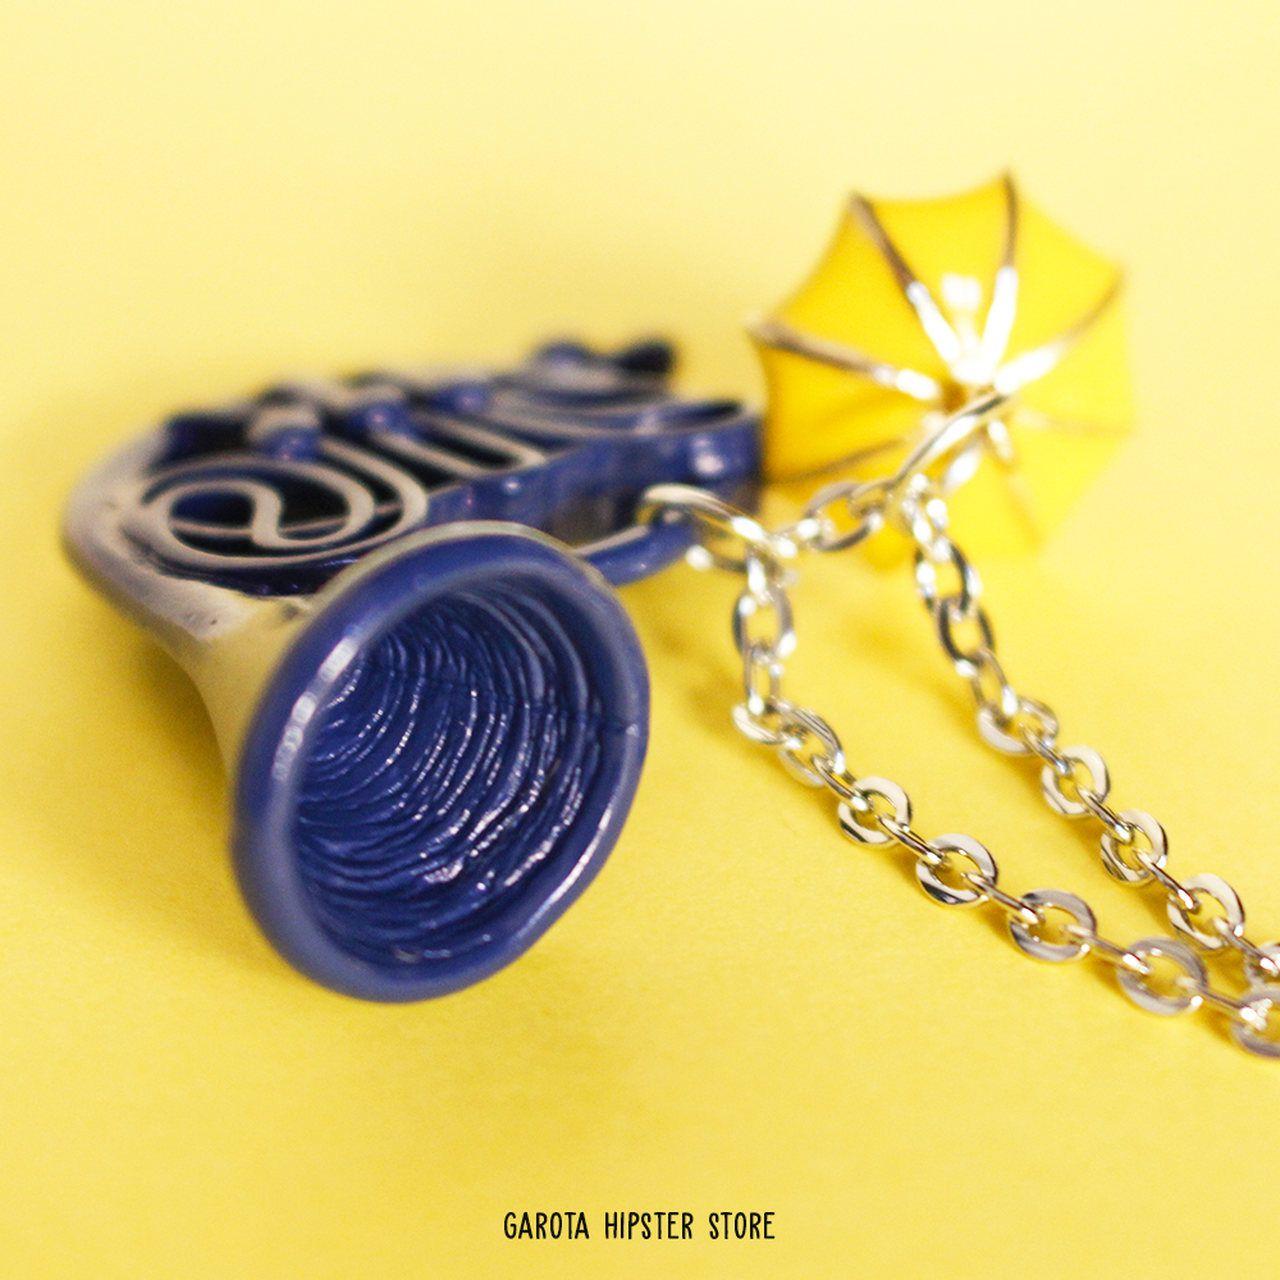 Colar How I - Trompa Azul & Guarda-chuva amarelo